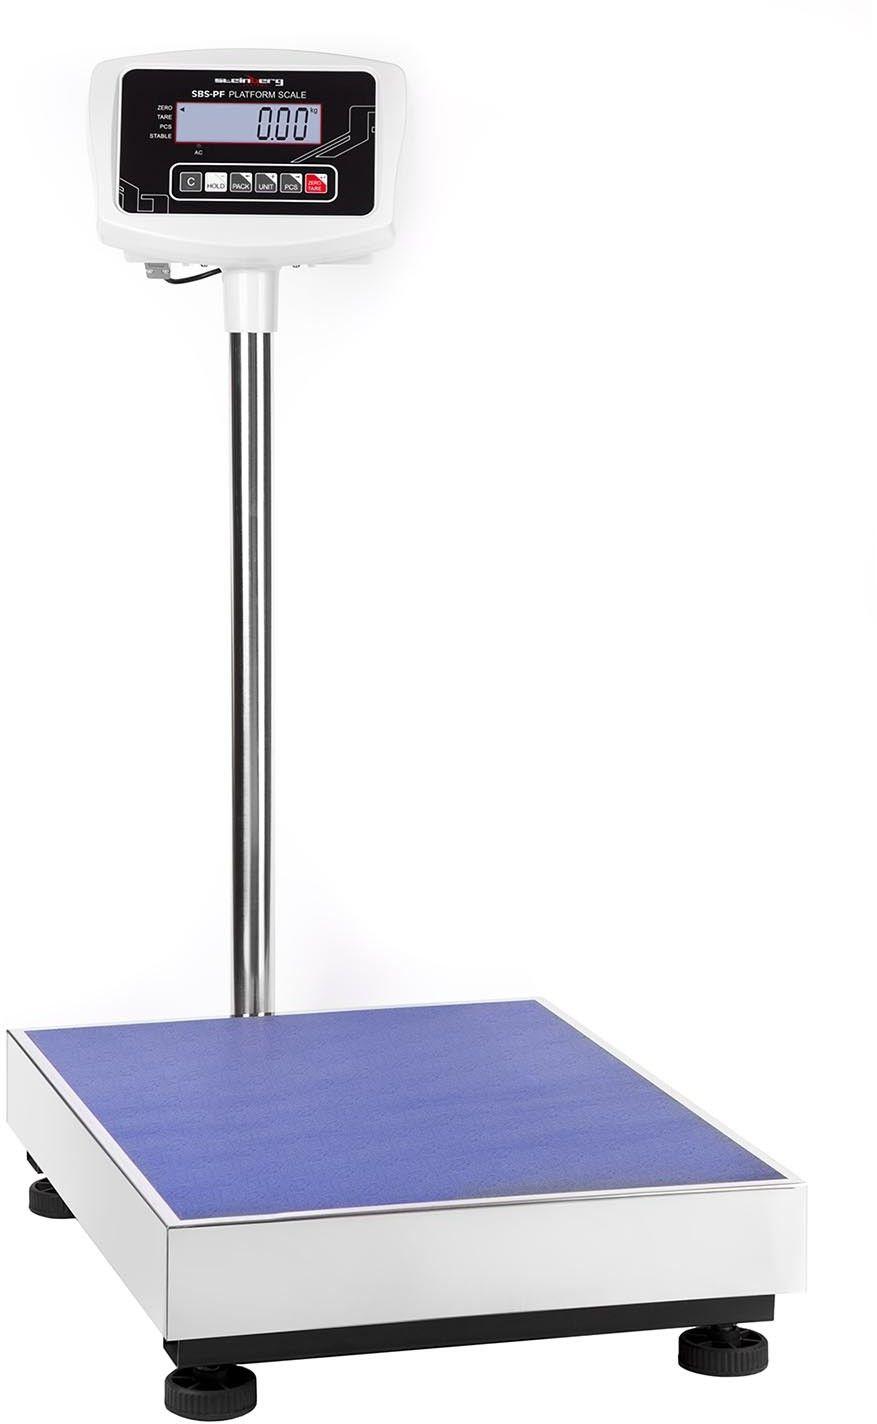 Waga platformowa - 150 kg / 50 g - Steinberg Systems - SBS-PF-150 - 3 lata gwarancji/wysyłka w 24h